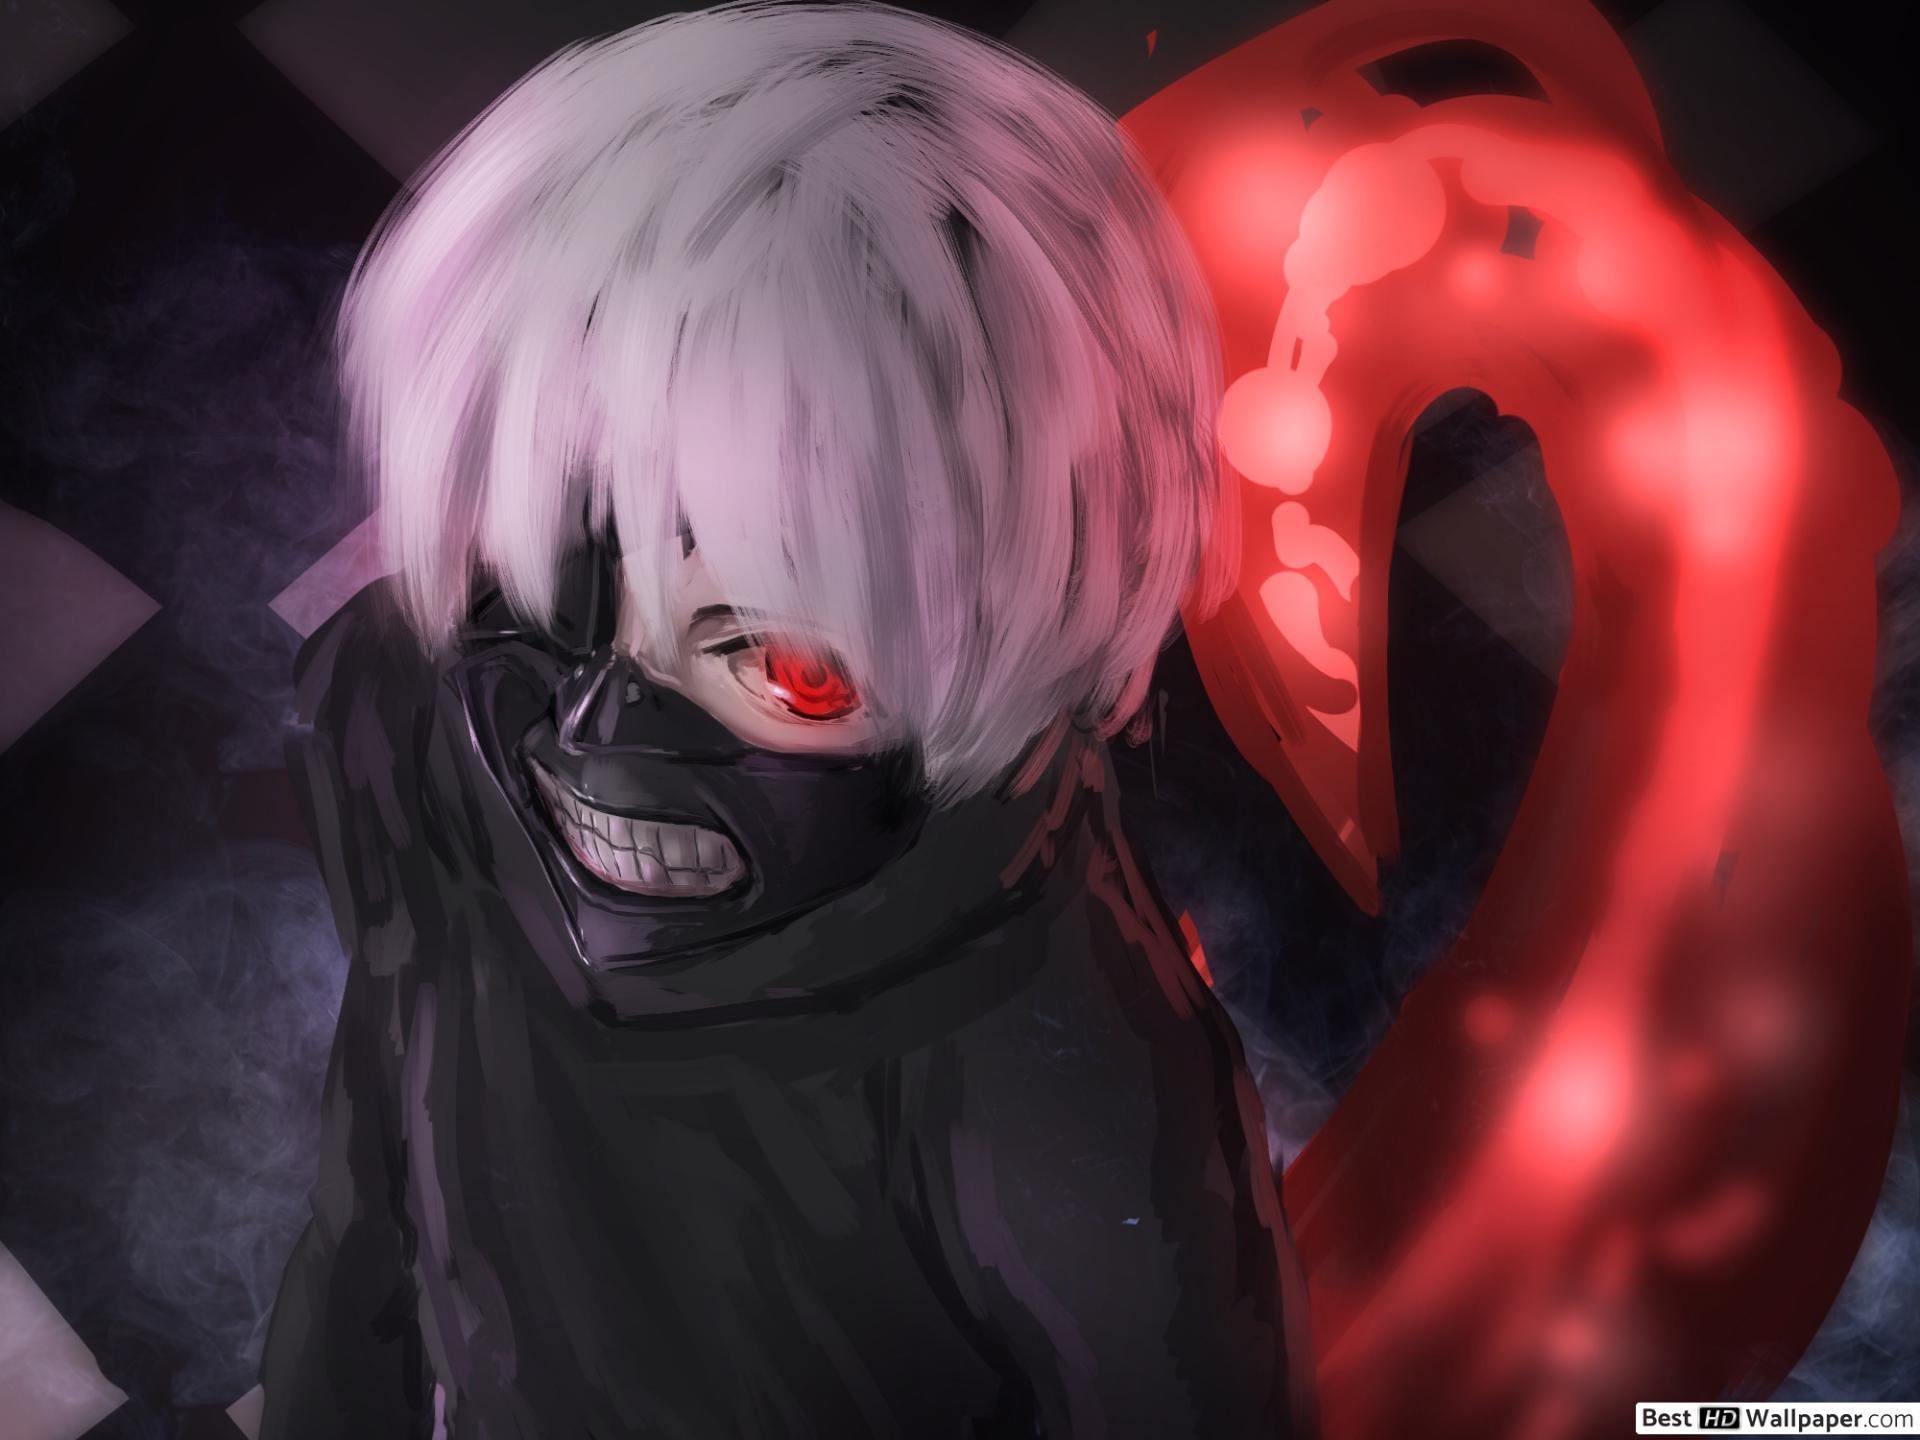 Black Reaper Kaneki Background 2415243 Hd Wallpaper Backgrounds Download